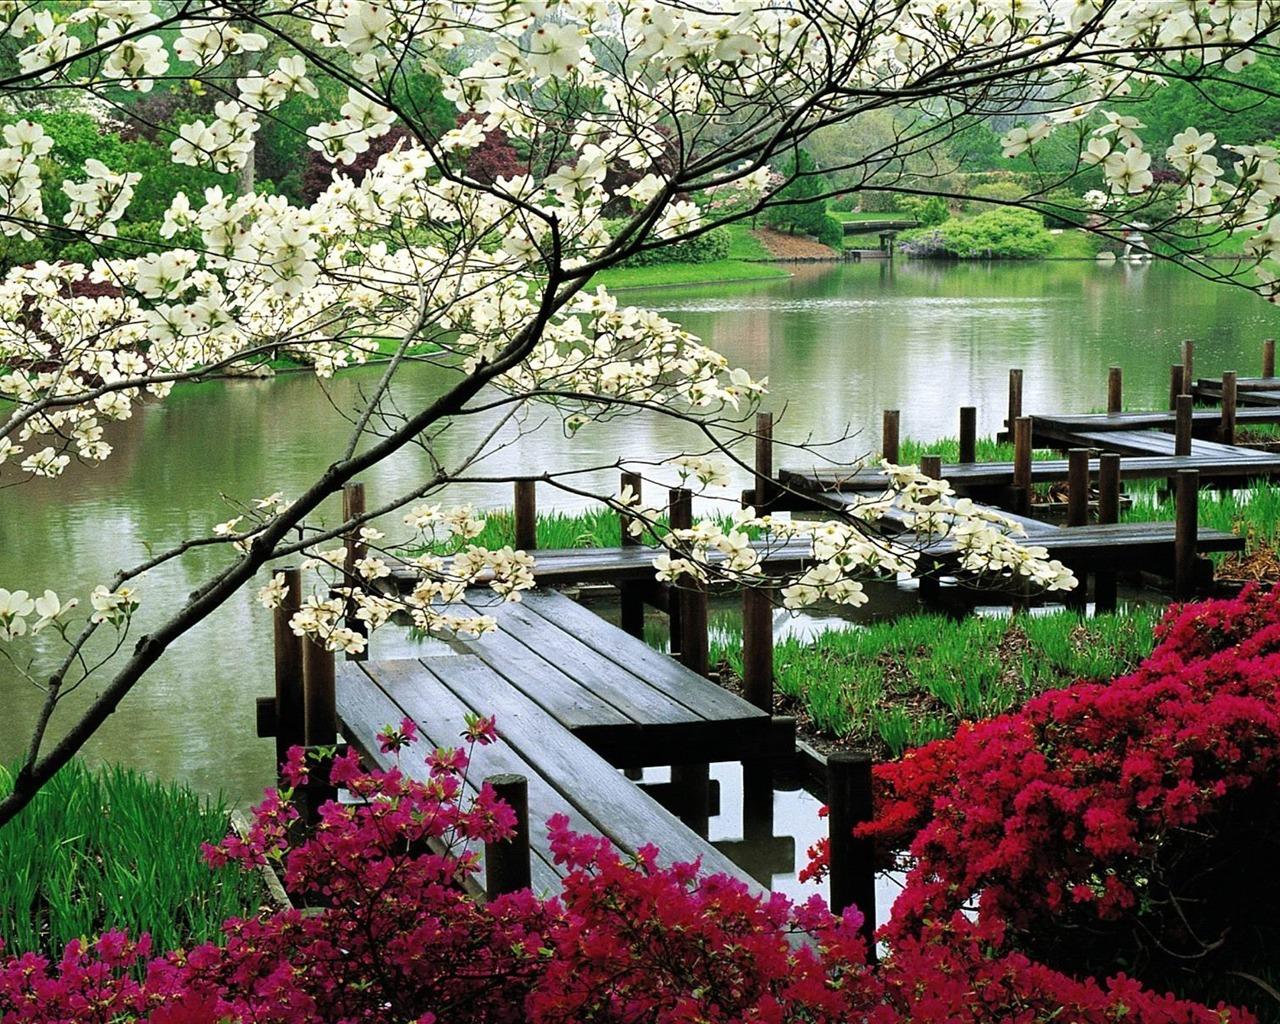 Jardin japonais paysage naturel cran fond d 39 cran for Jardin japonais fond d ecran